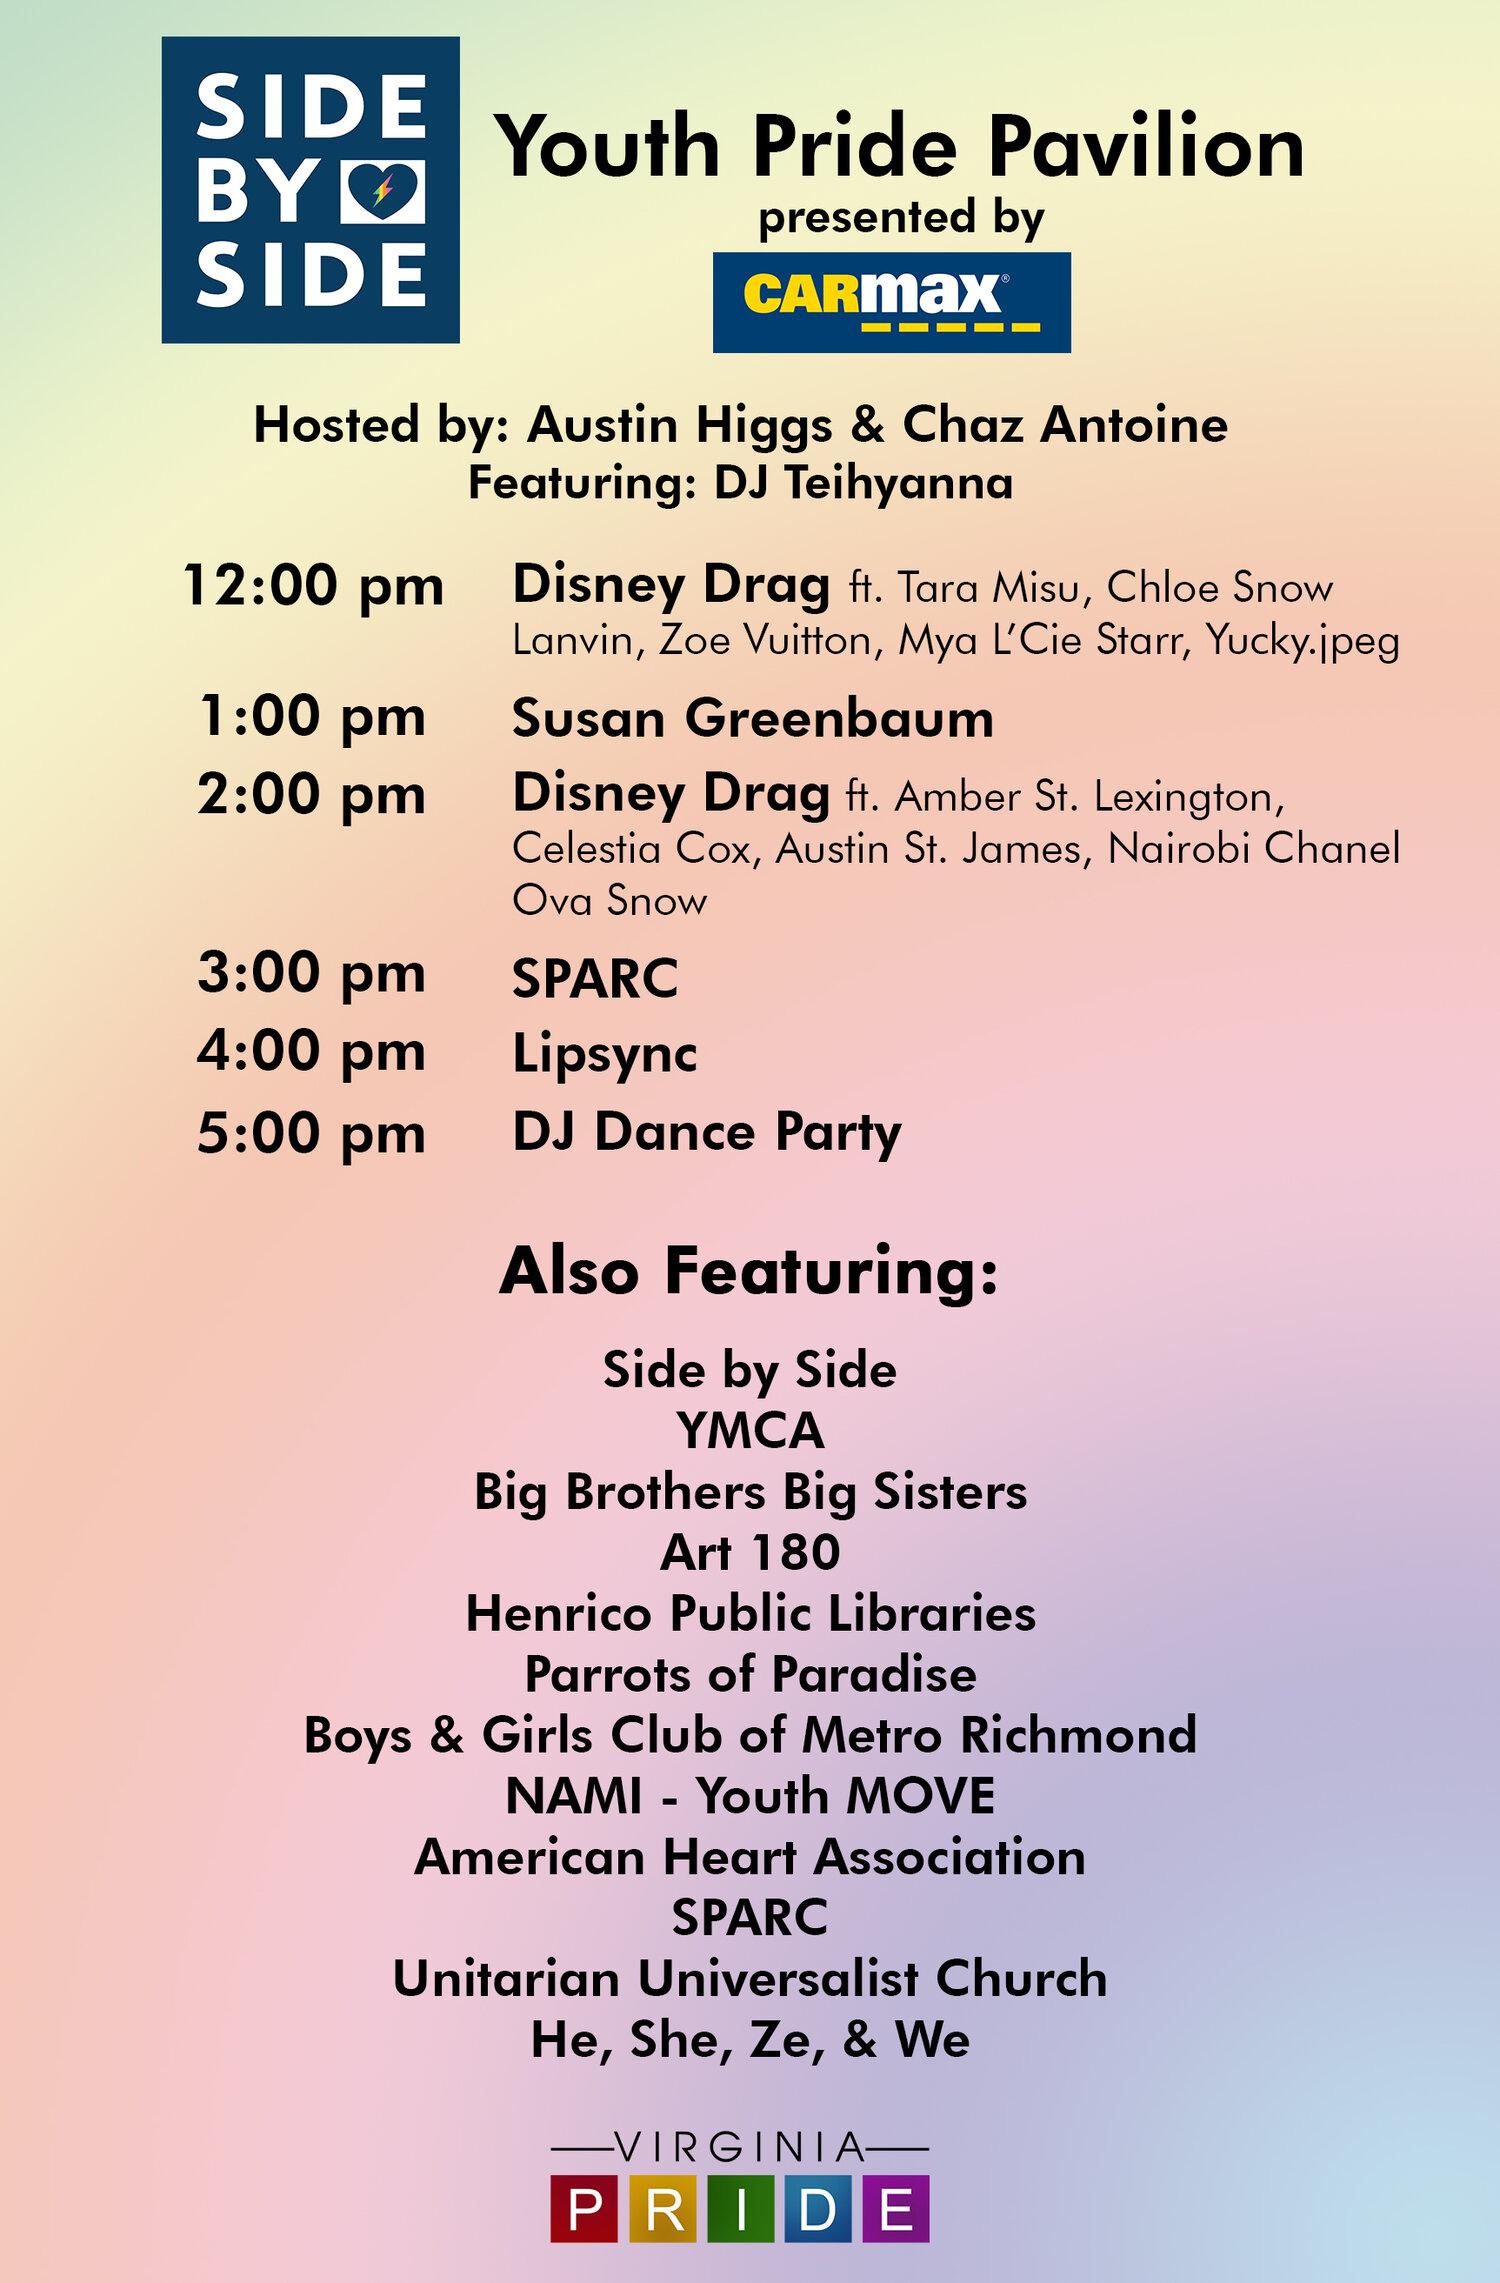 Youth Pride Pavilion Lineup 2019.jpg